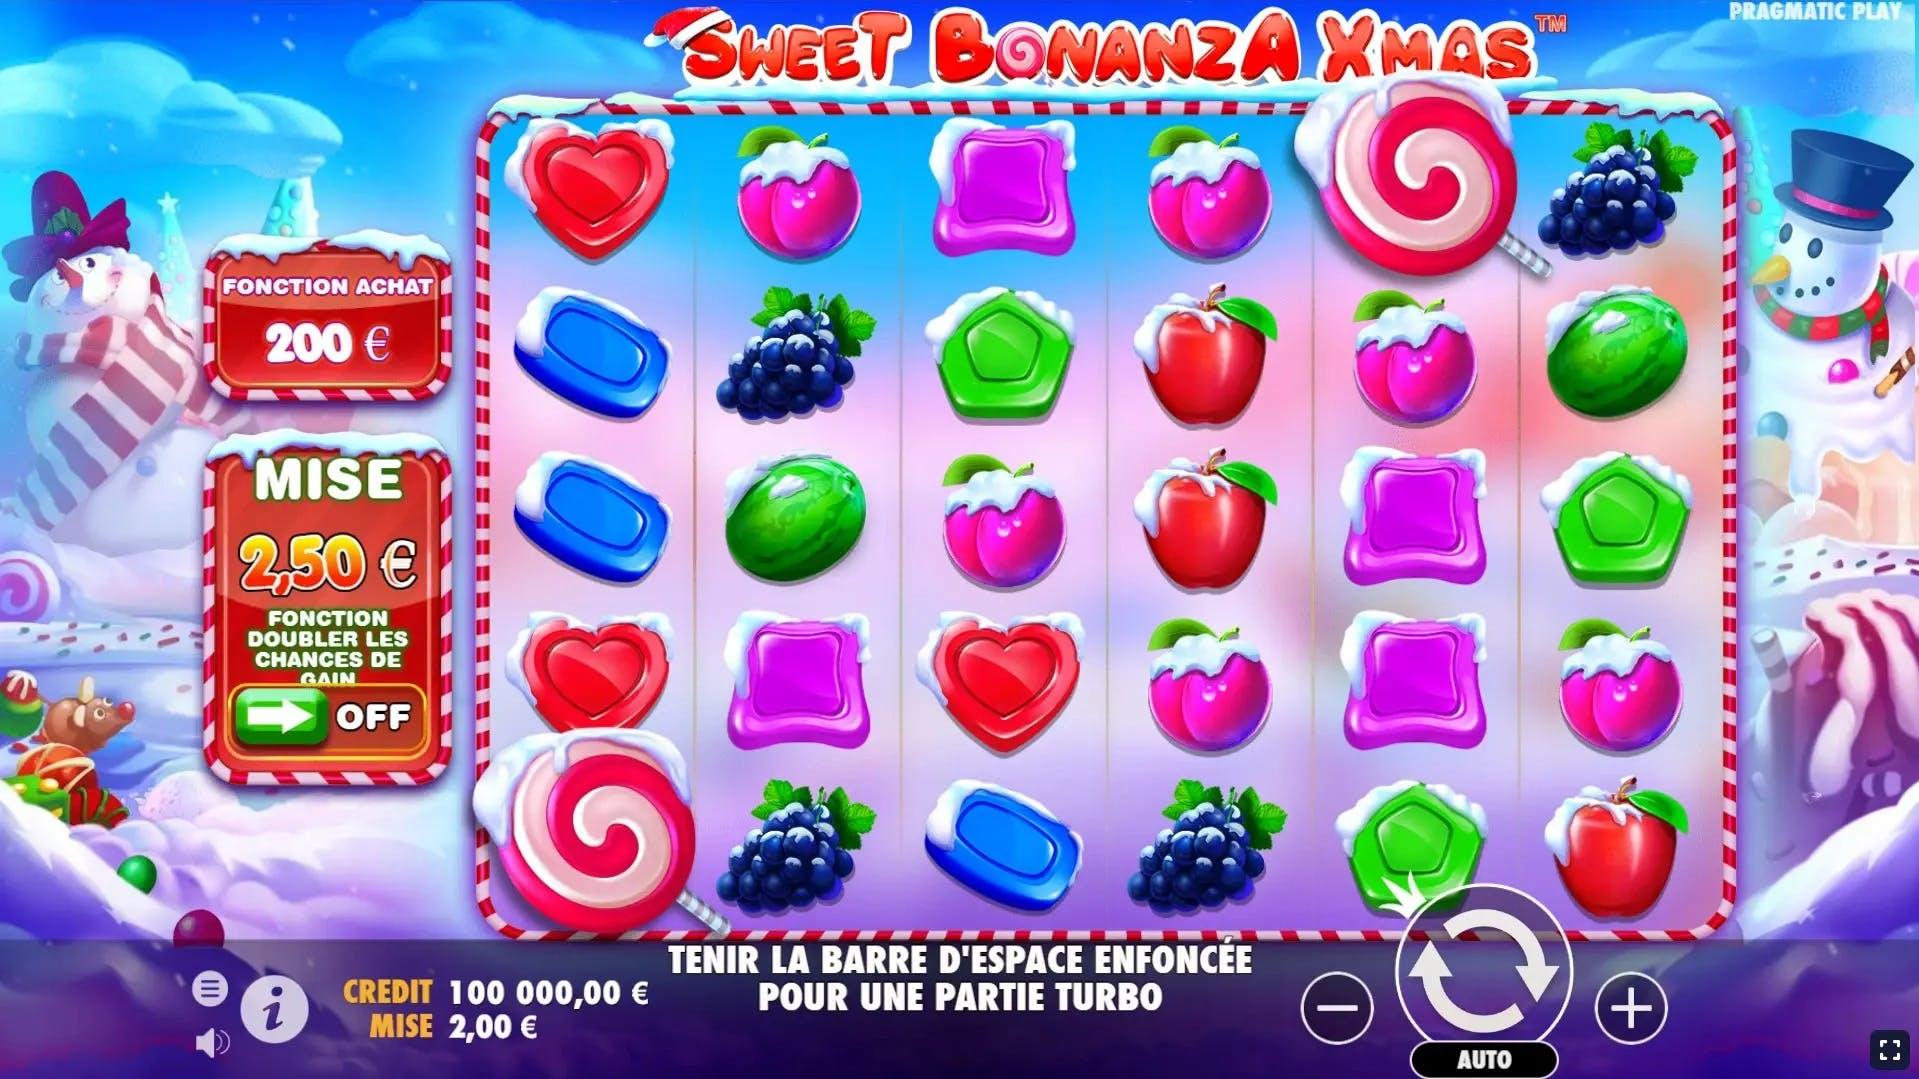 sweet bonanza xmas gameplay de pragmatic play